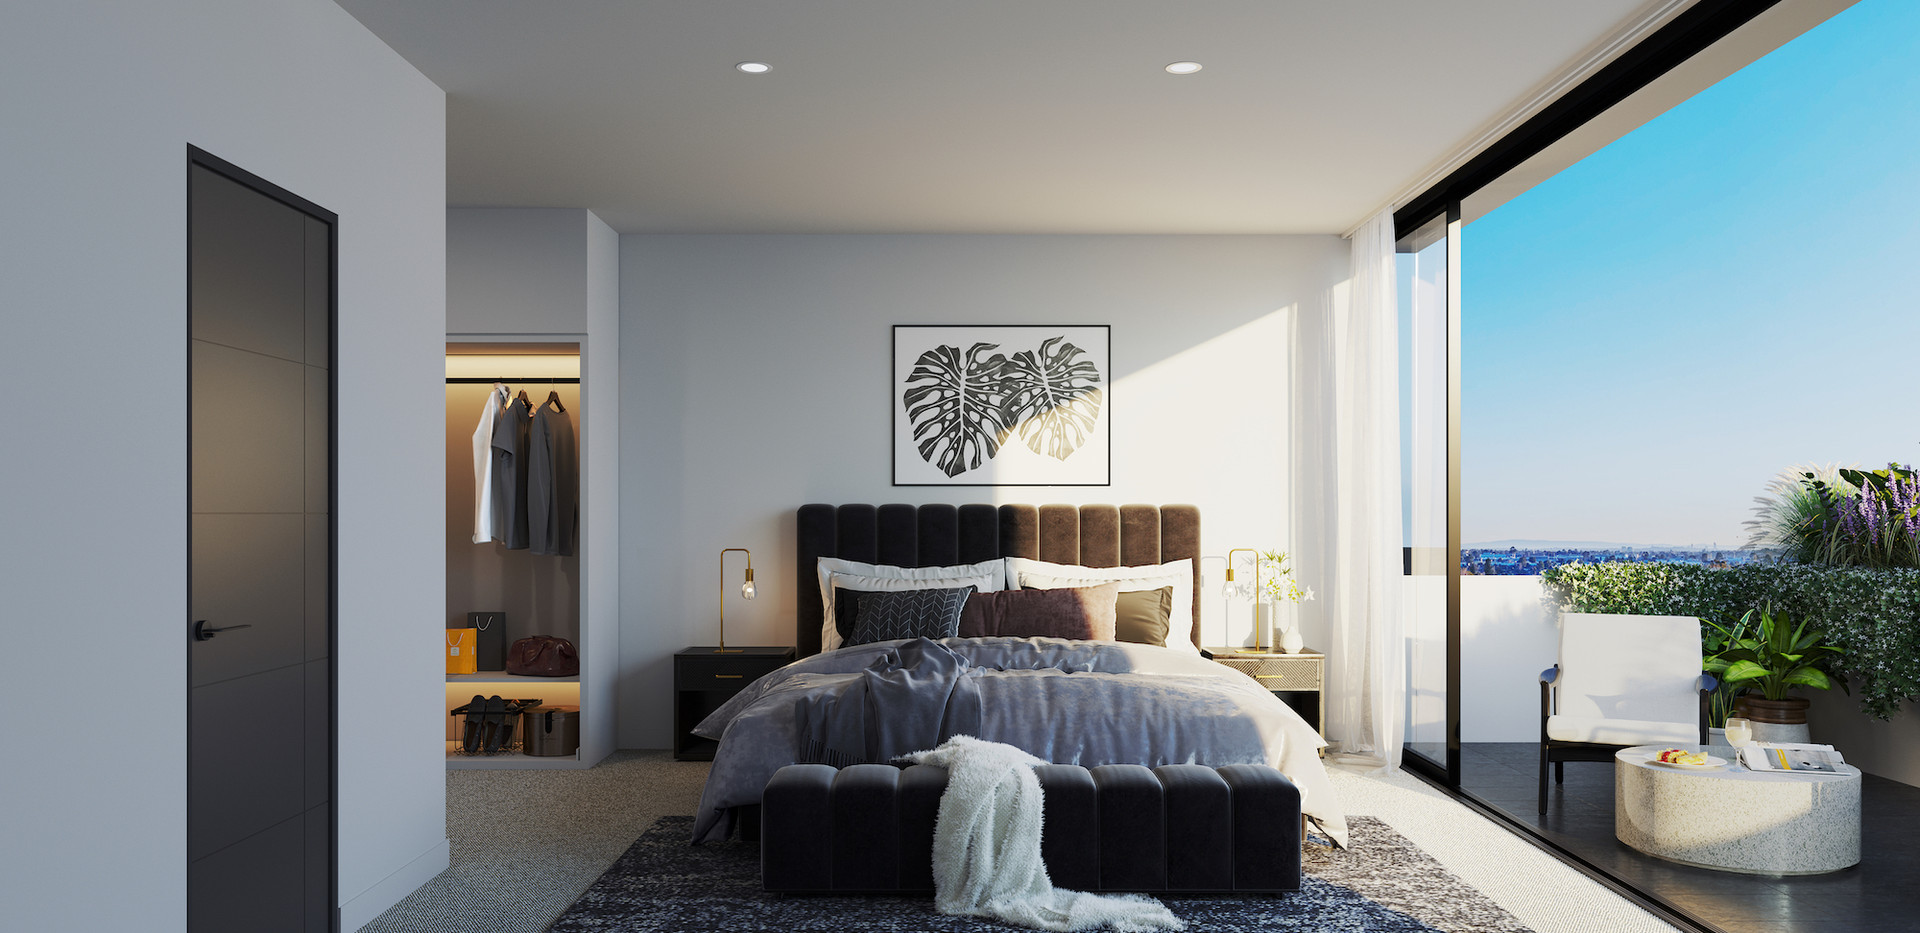 Luda Studios_Bedroom_Opt 2_Sml_Final.jpe